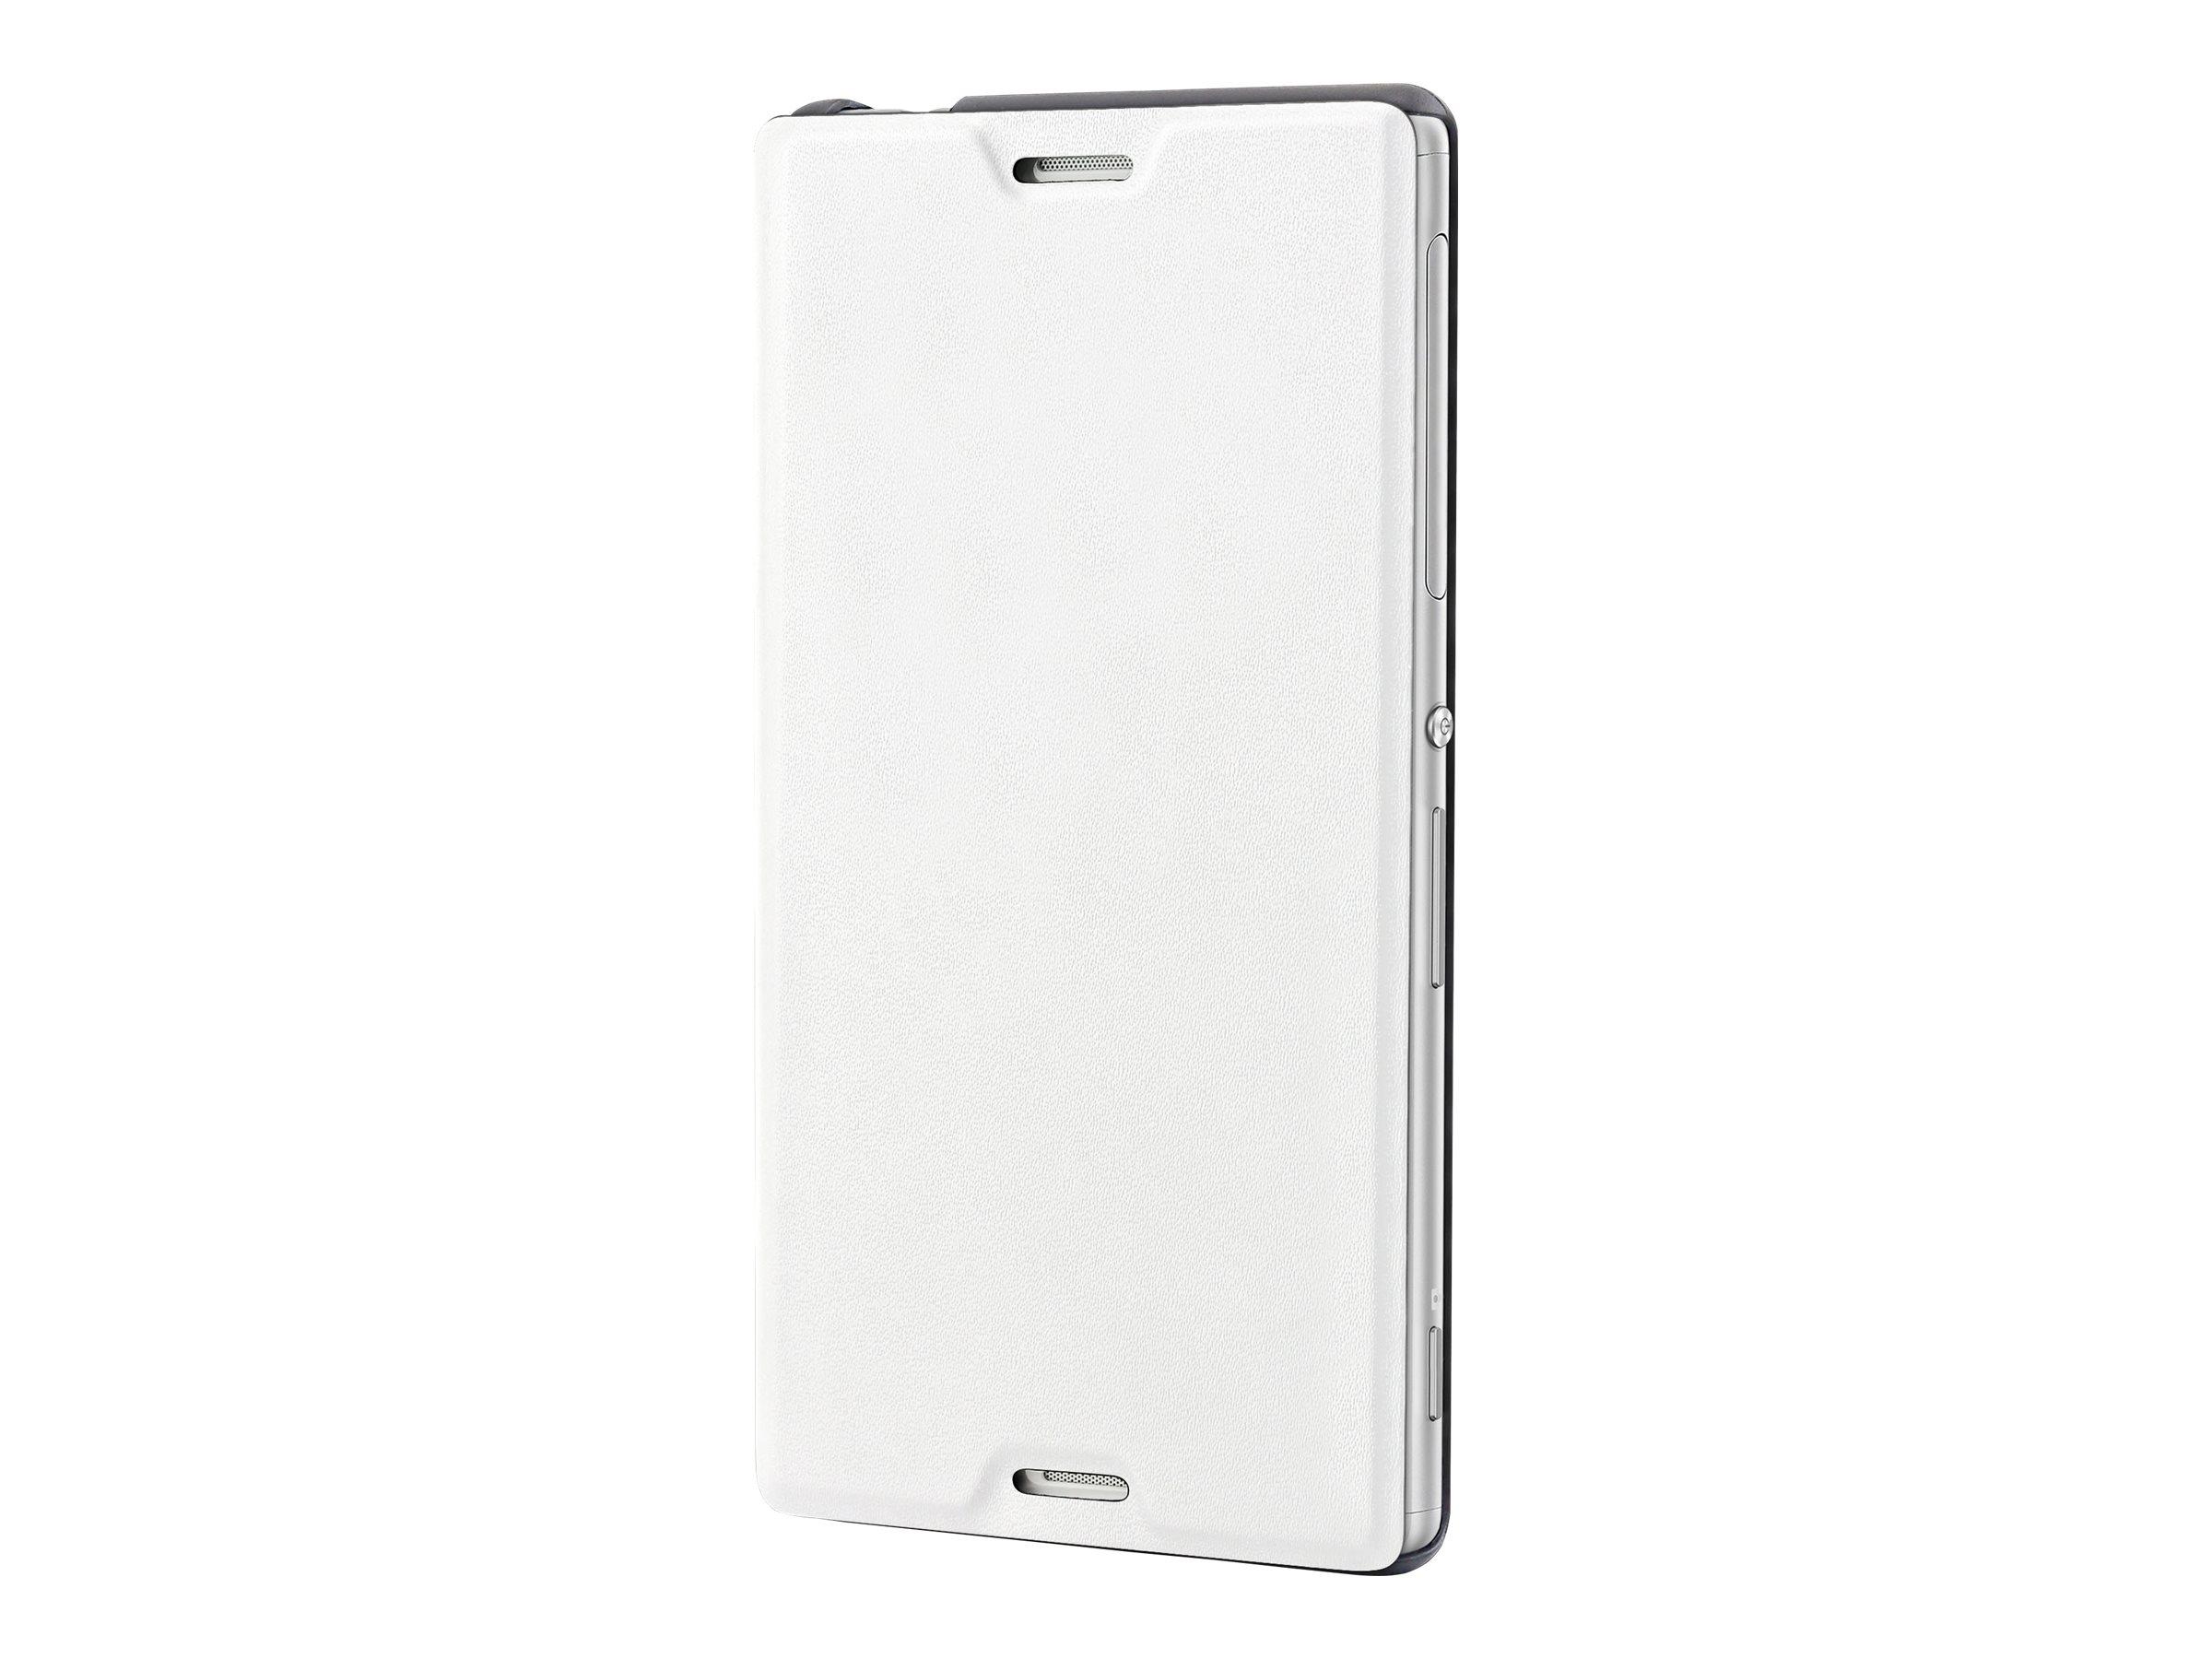 Muvit MFX Easy Folio Case - Protection à rabat pour Sony XPERIA M4 Aqua - blanc